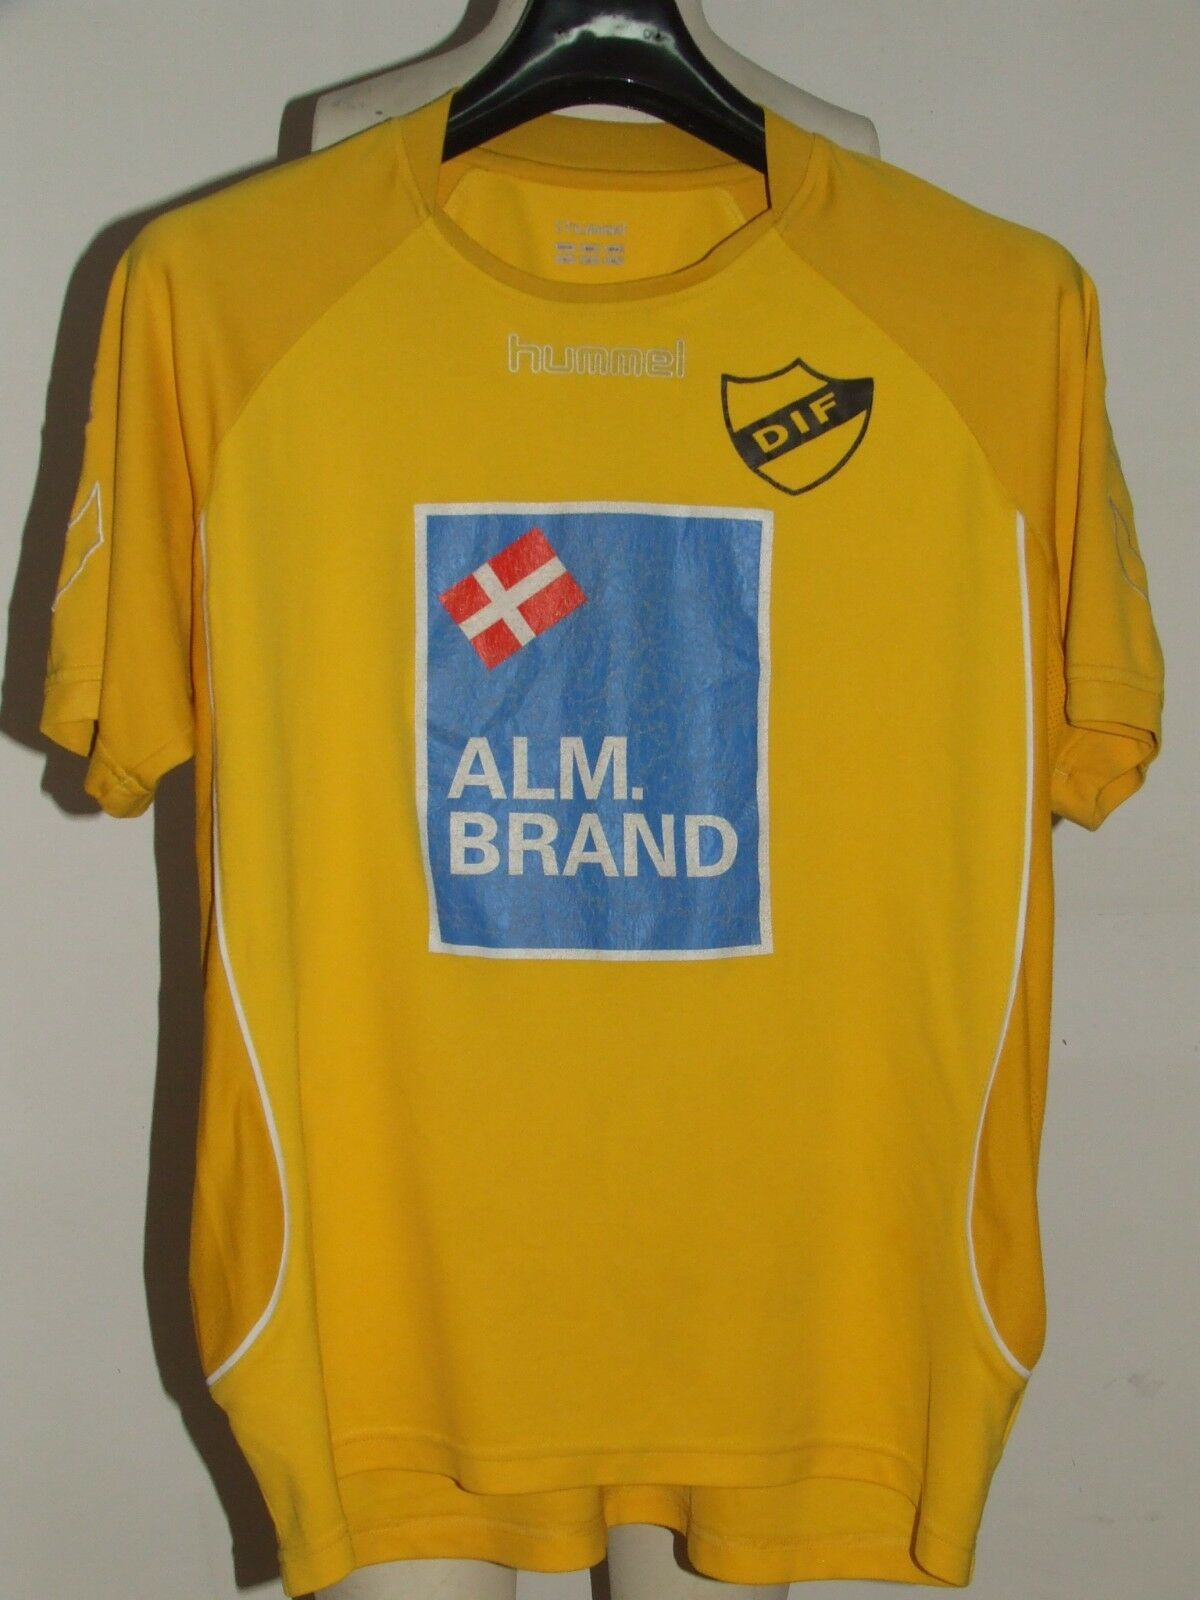 Fußballtrikot Trikot Maillot Maillot Maillot Camiseta Sport matchworn djurgardens Nr10 4922a1